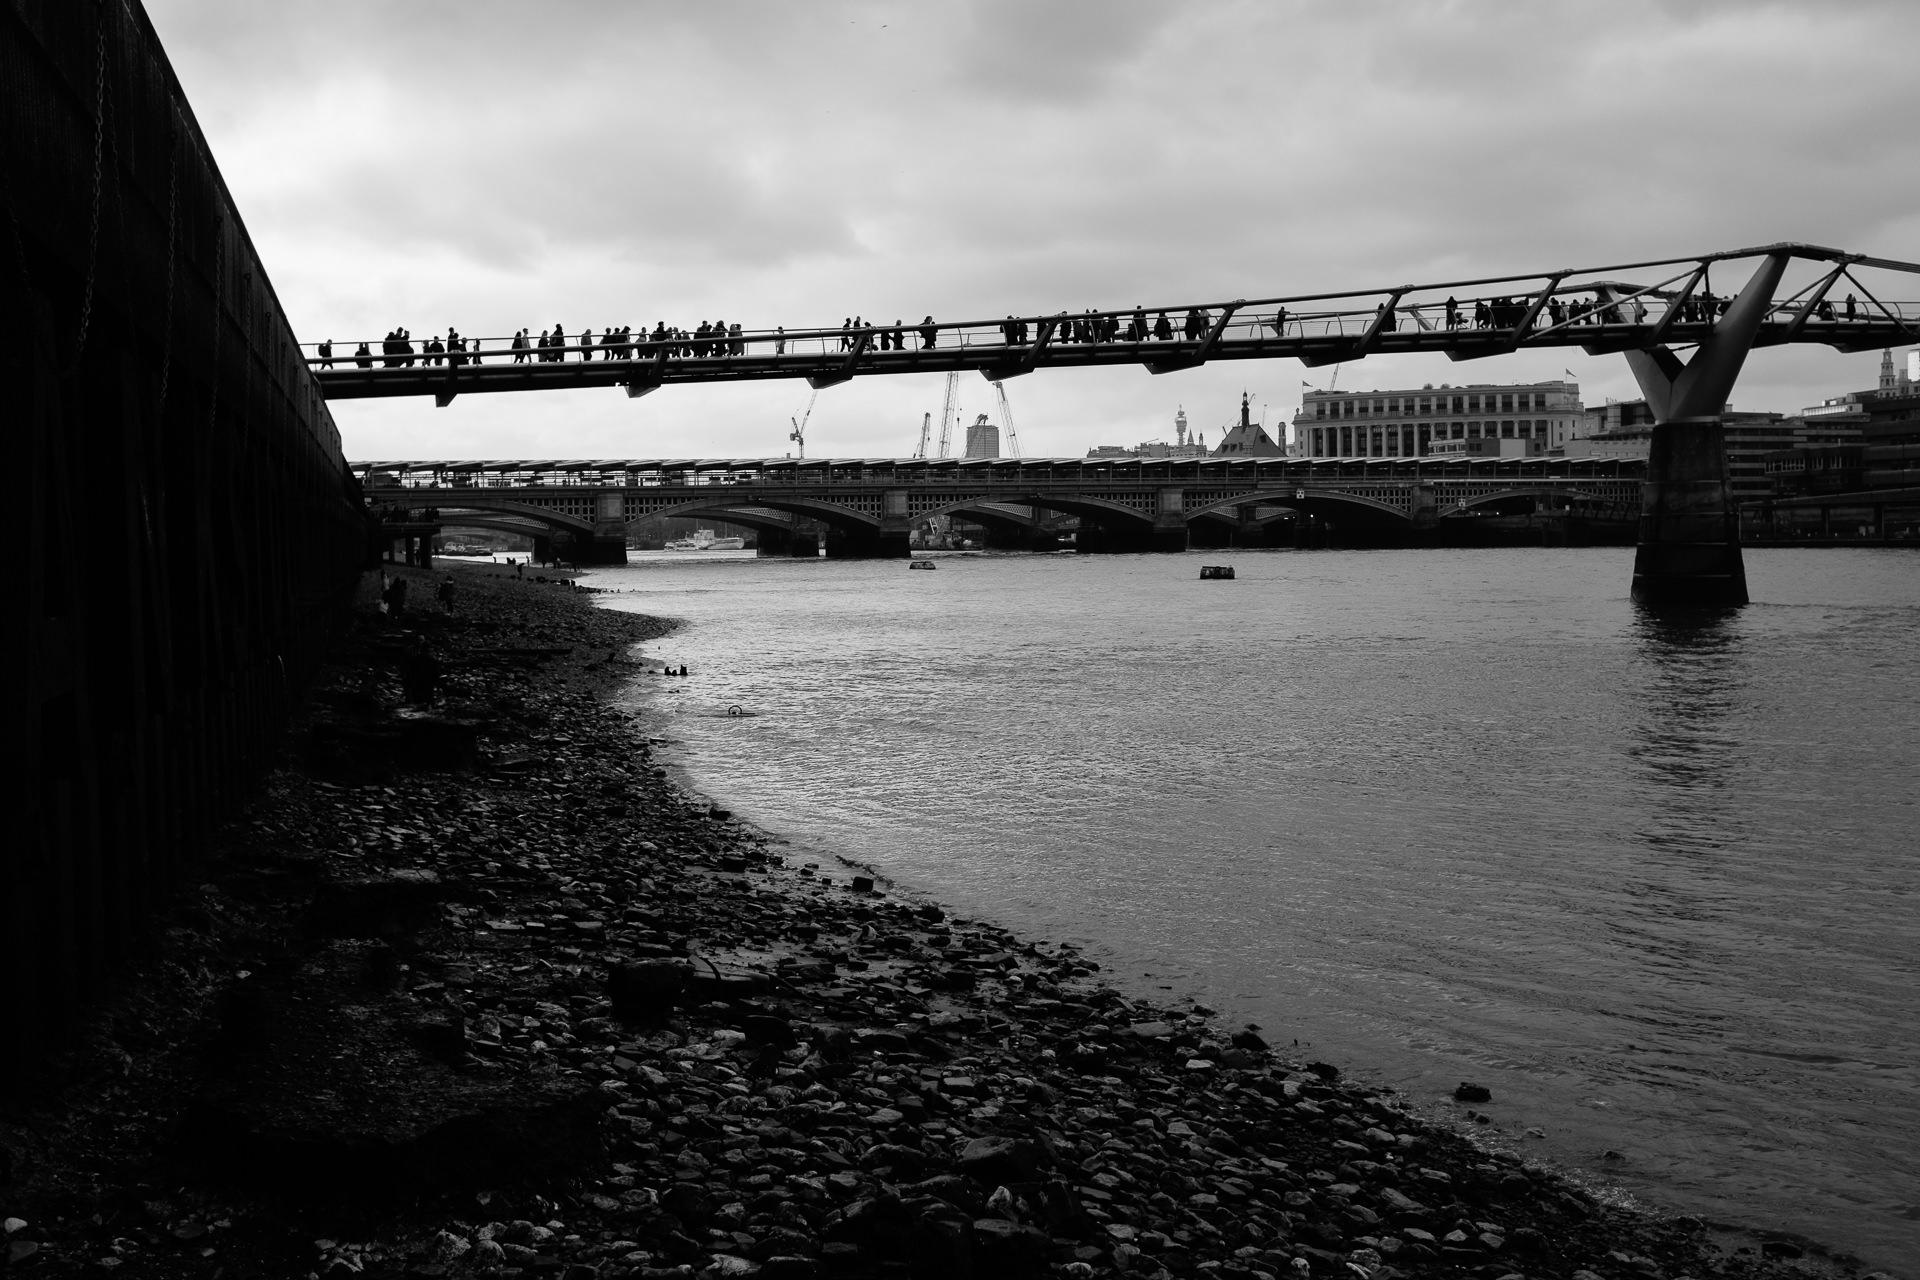 Millenium bridge in London full of people in black and white